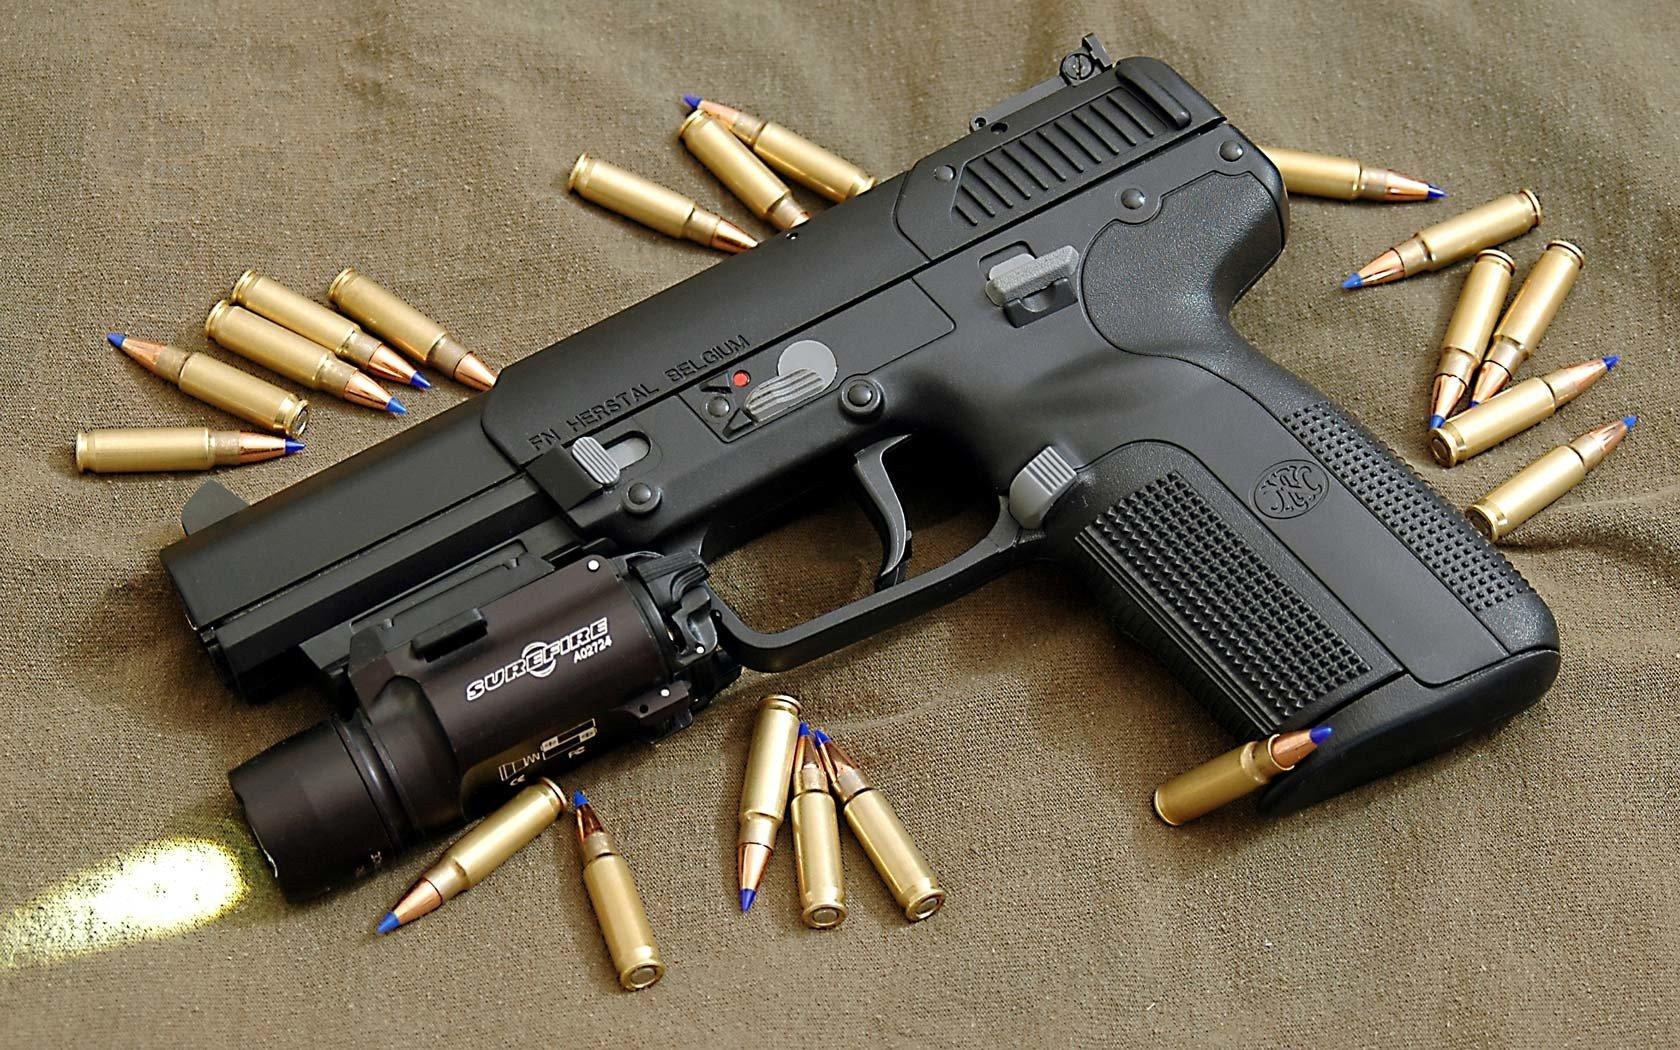 Weapons - Fn Five-Seven Pistol  Fabrique Nationale Five-Seven Surefire Light Handgun Pistol Magnum Wallpaper